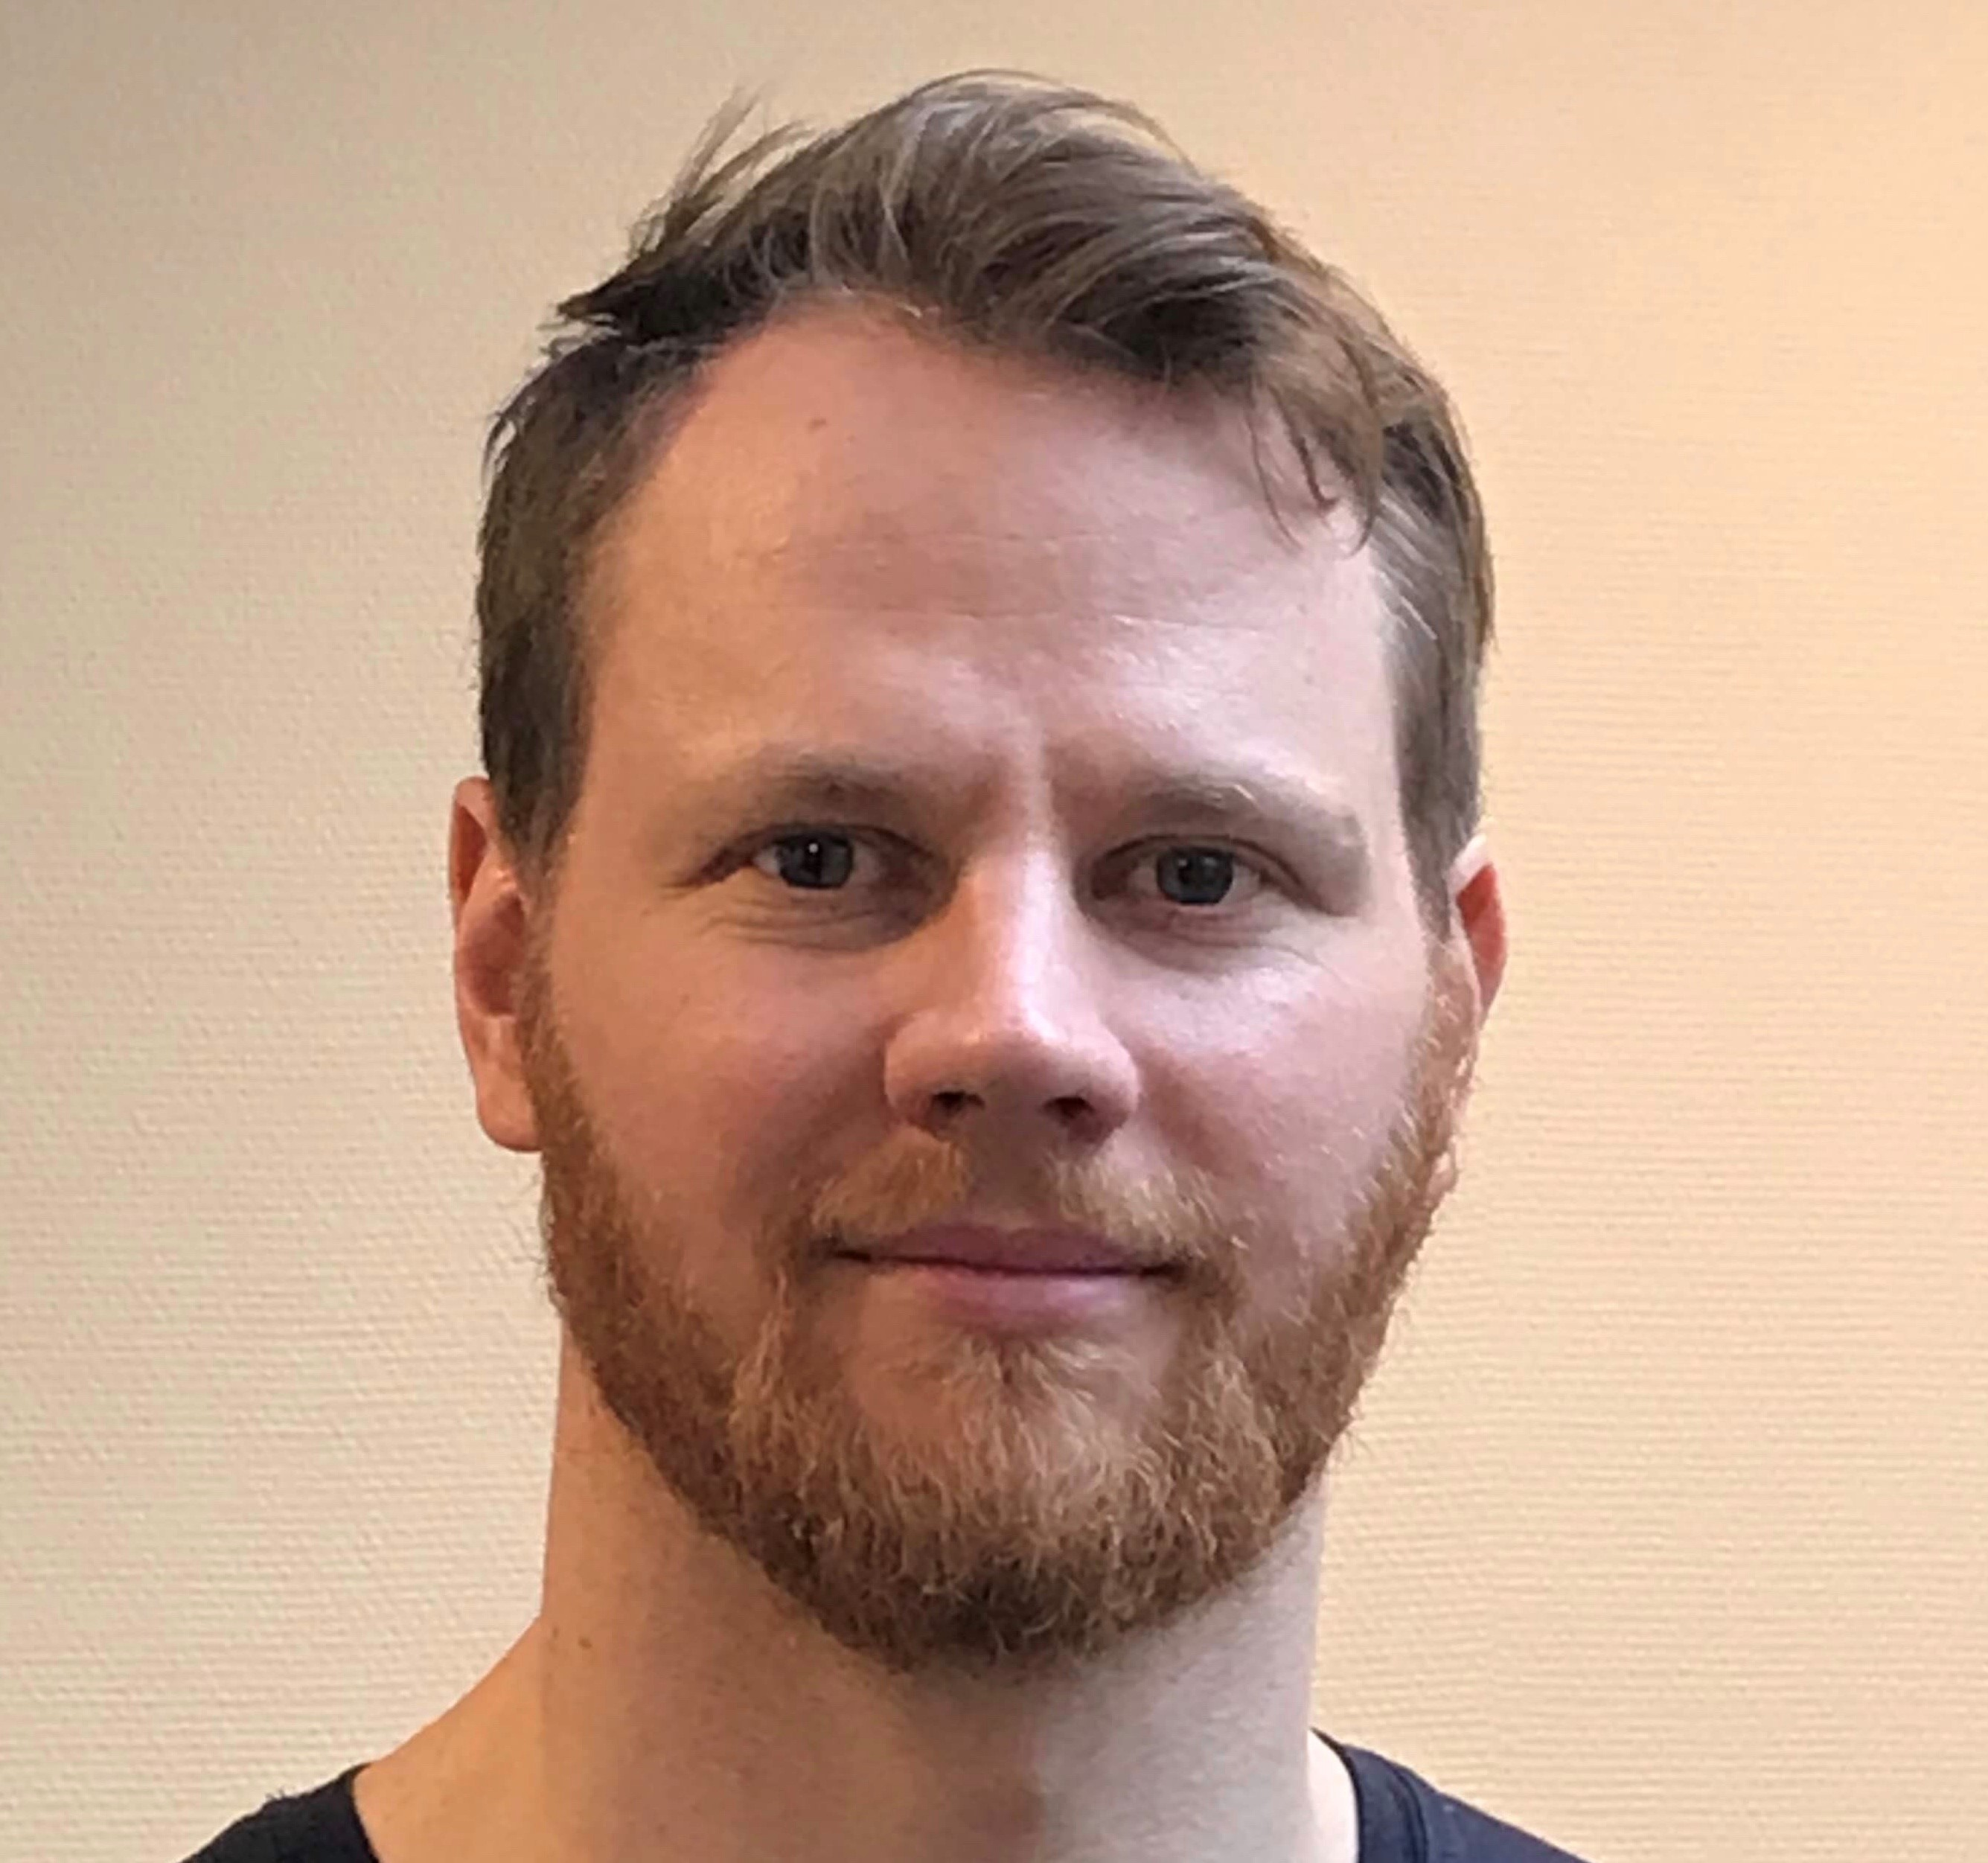 Jesper Øigård